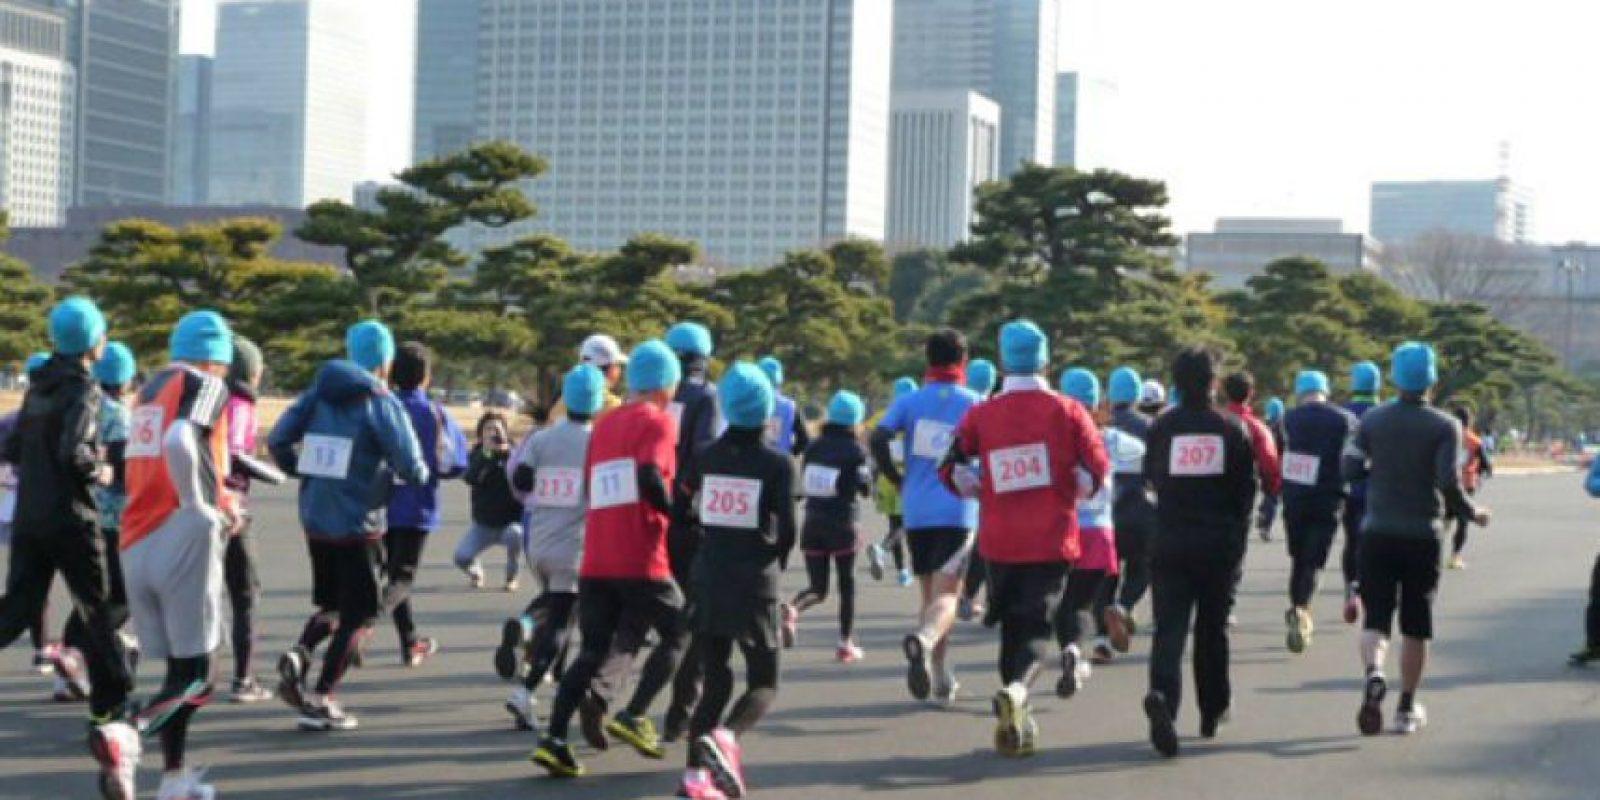 Abre la temporada de los World Marathon Majors; se lleva a cabo a finales de febrero Foto:Tokyo42195.org